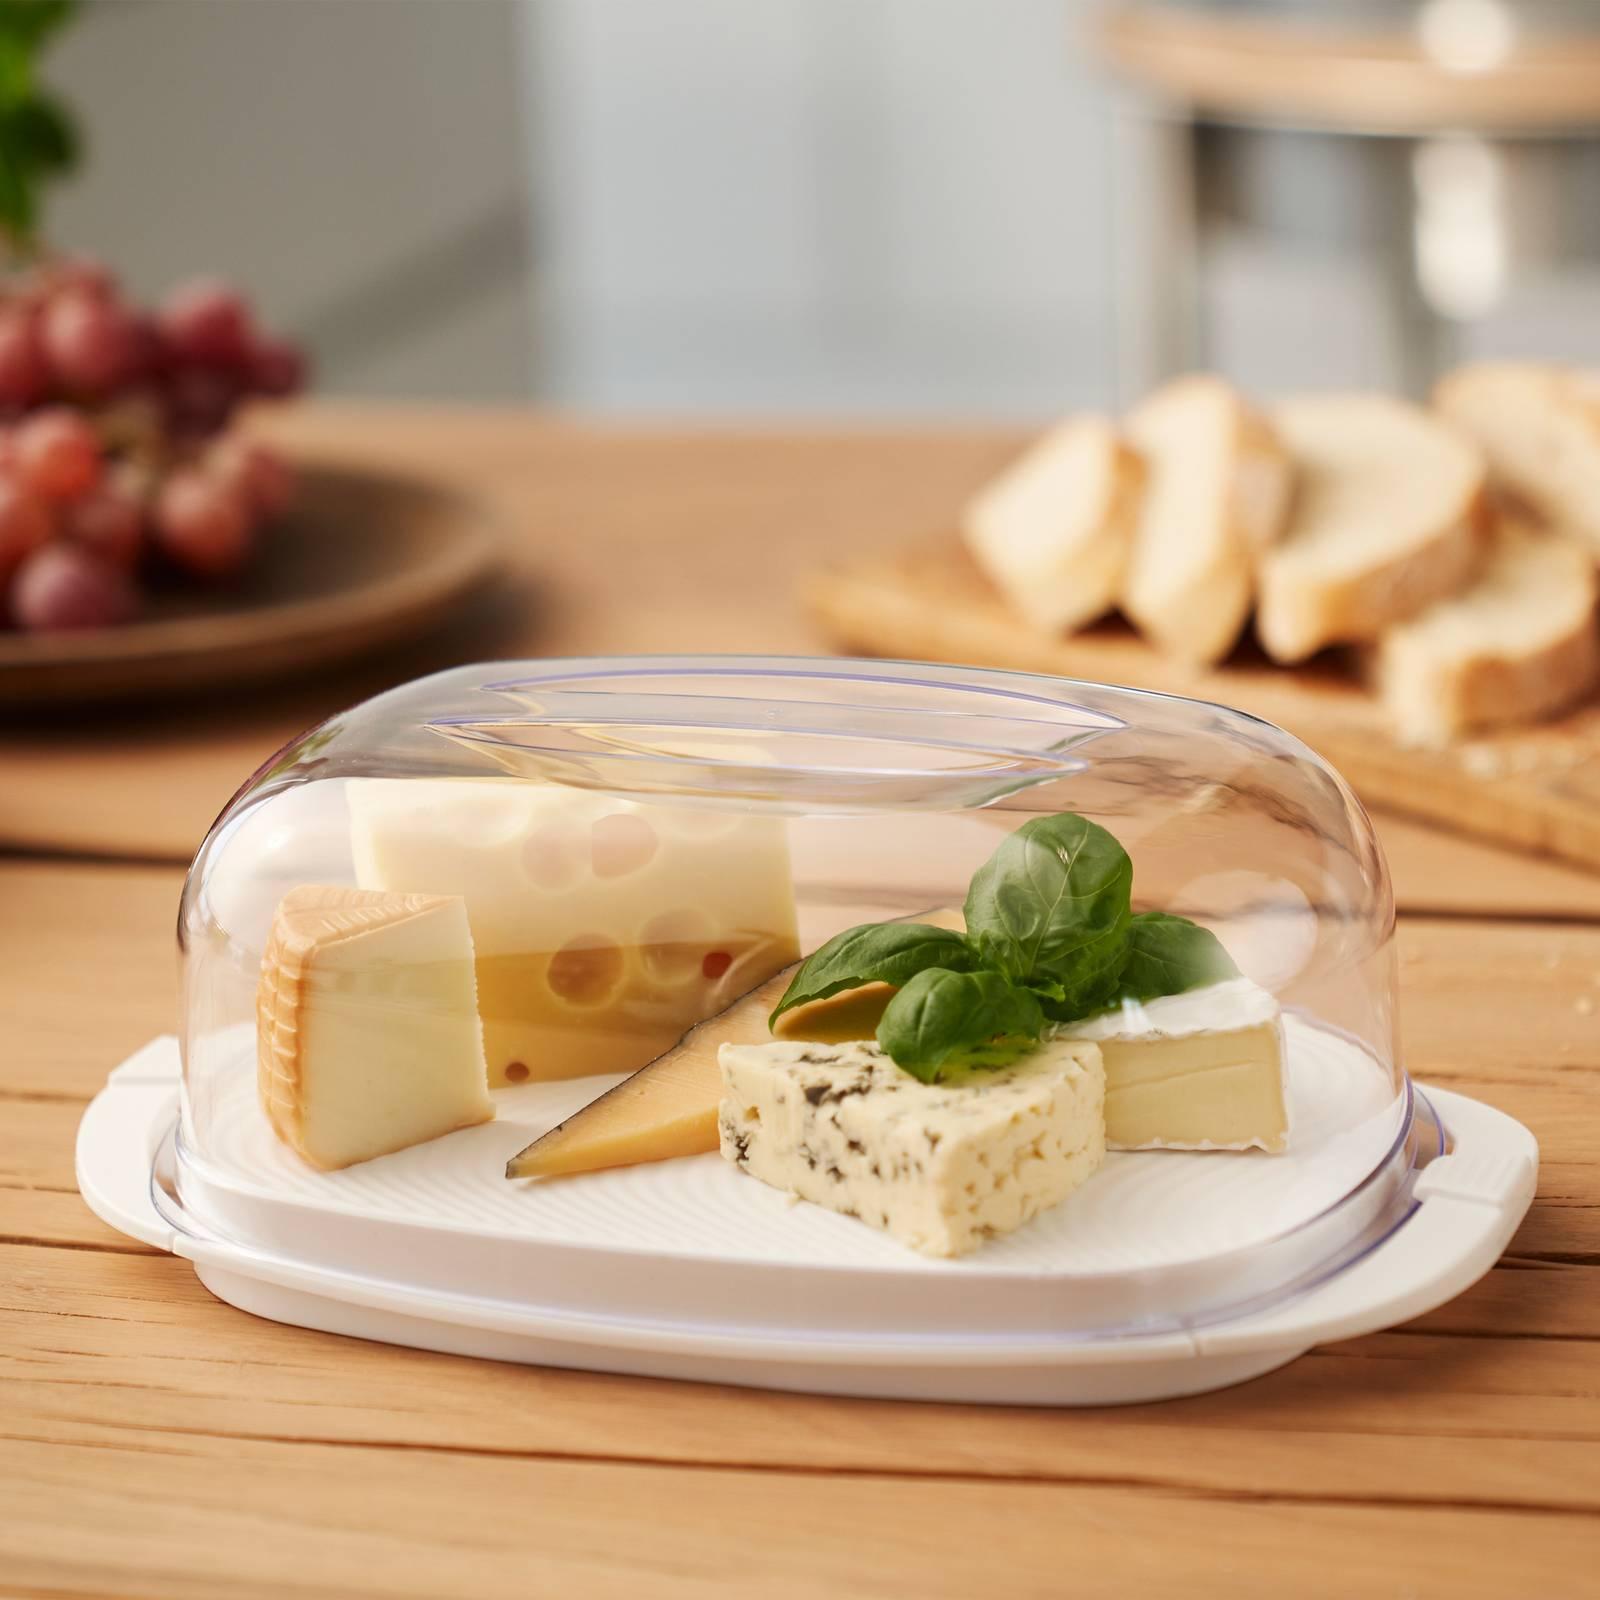 Butterdose Fresh 18 x 9,5 cm weiß ROTHO